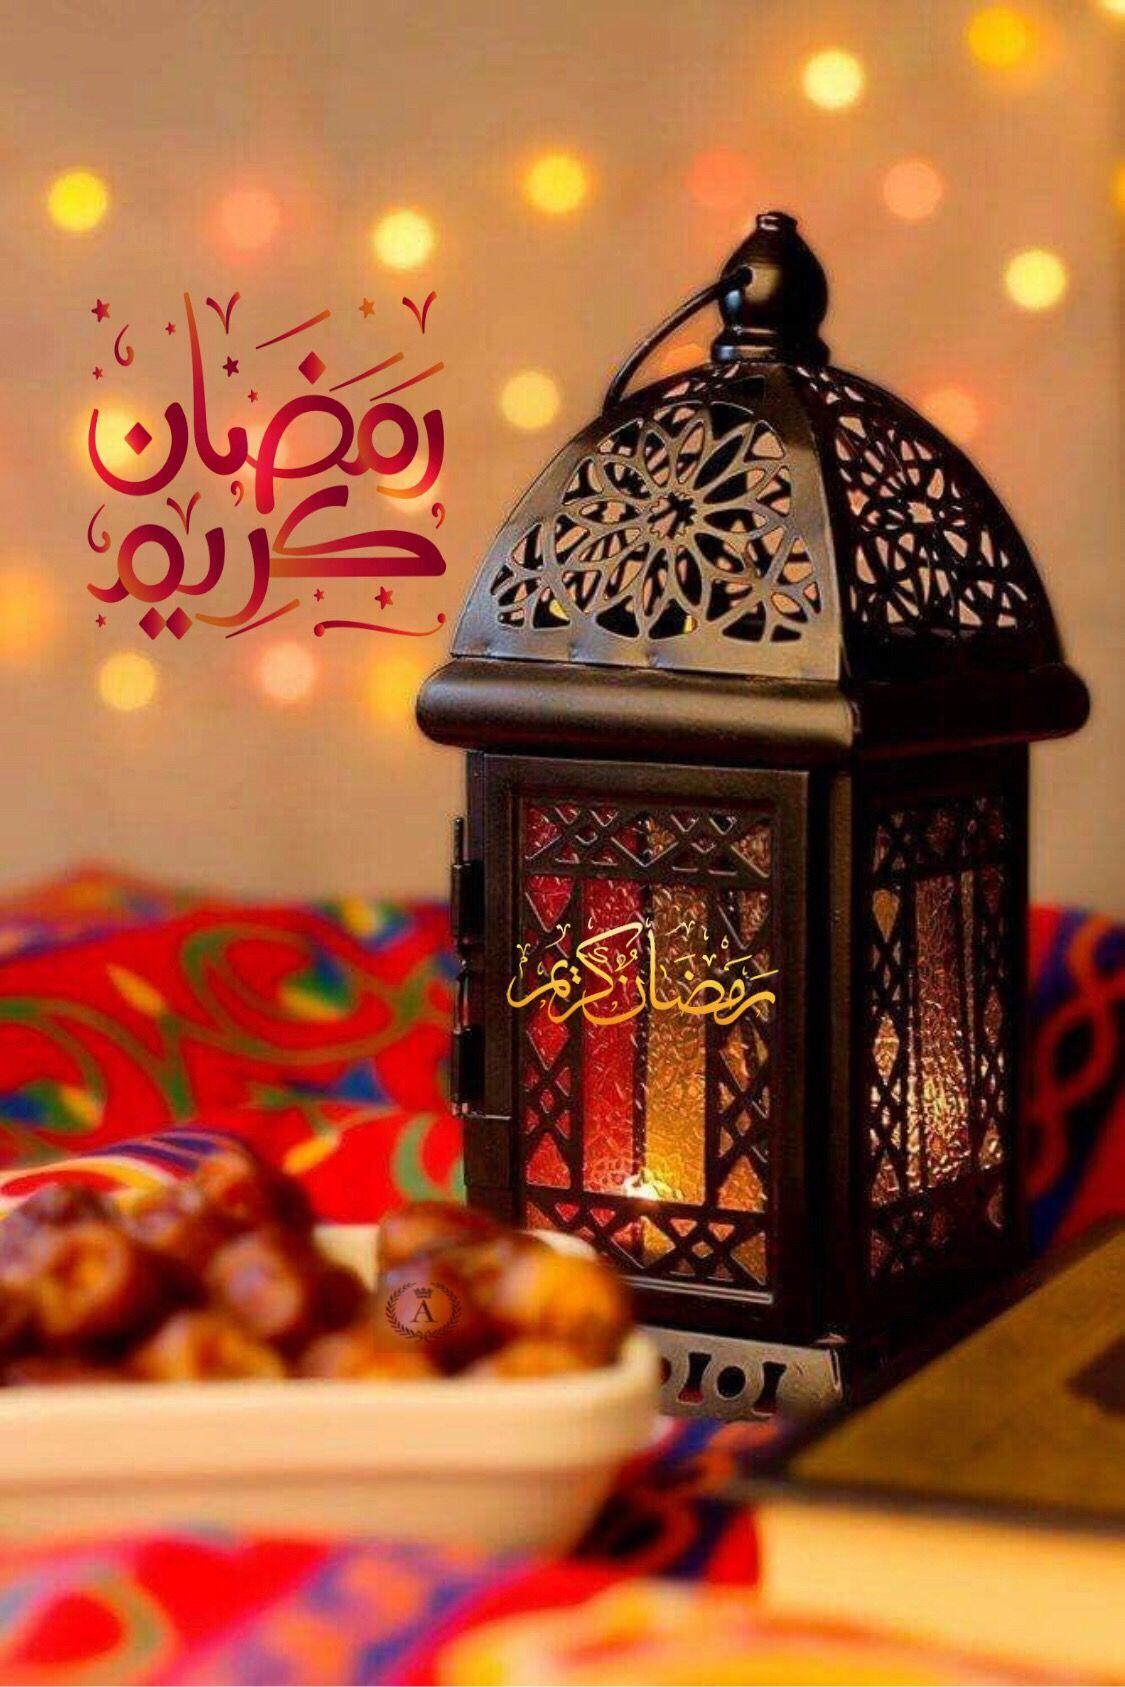 Pin By Diego On رمضان كريم Ramadan Lantern Ramadan Ramadan Kareem Pictures